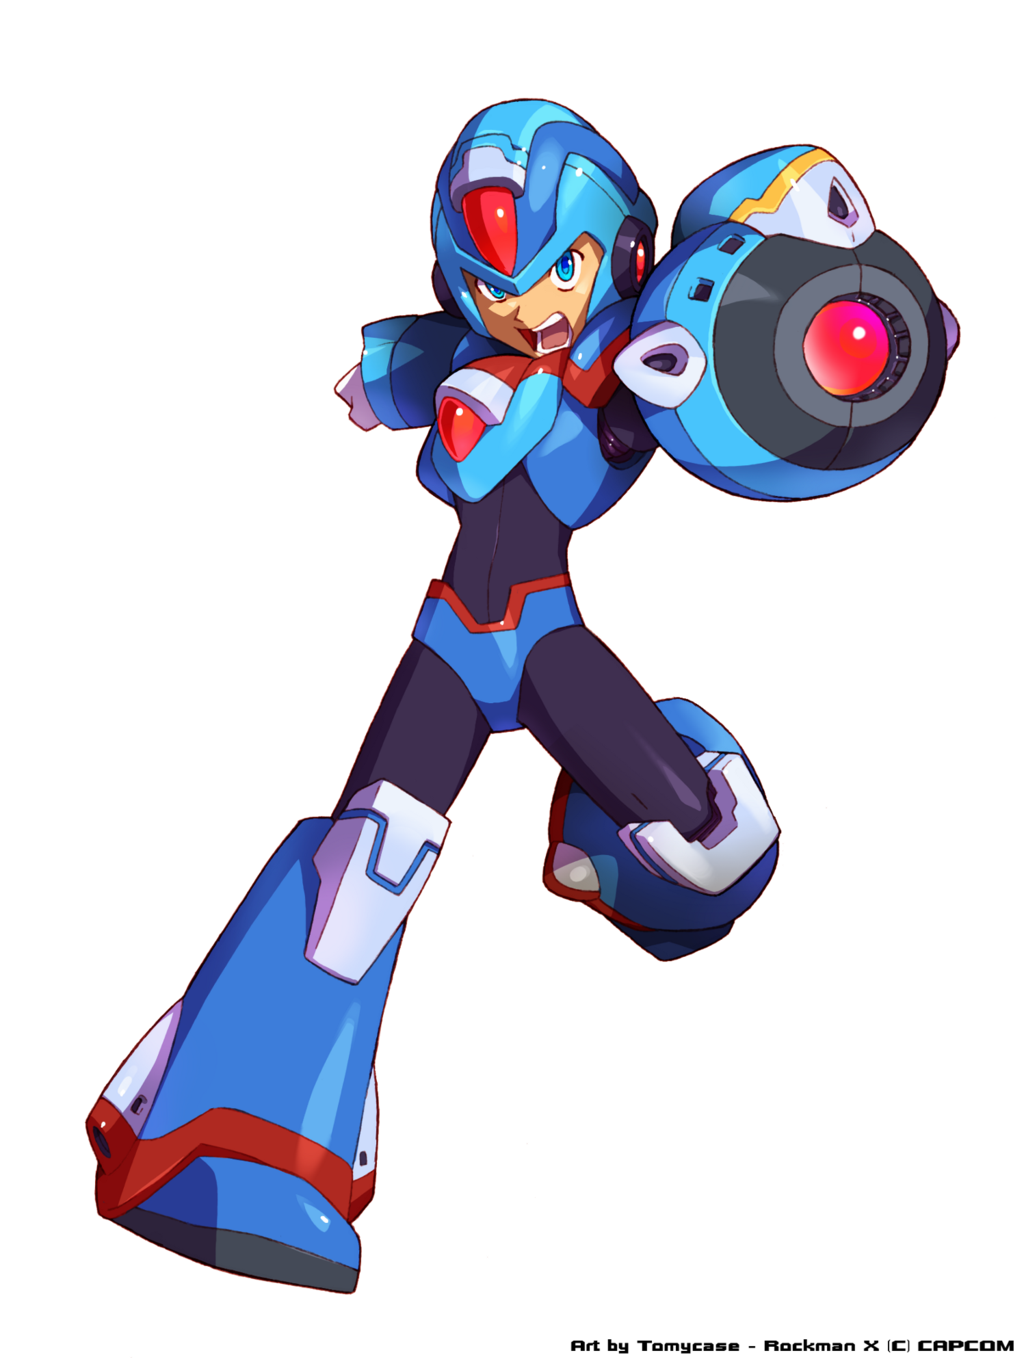 Megaman x coloring pages - Megaman X Revamp Hunter X By Tomycase Deviantart Com On Deviantart